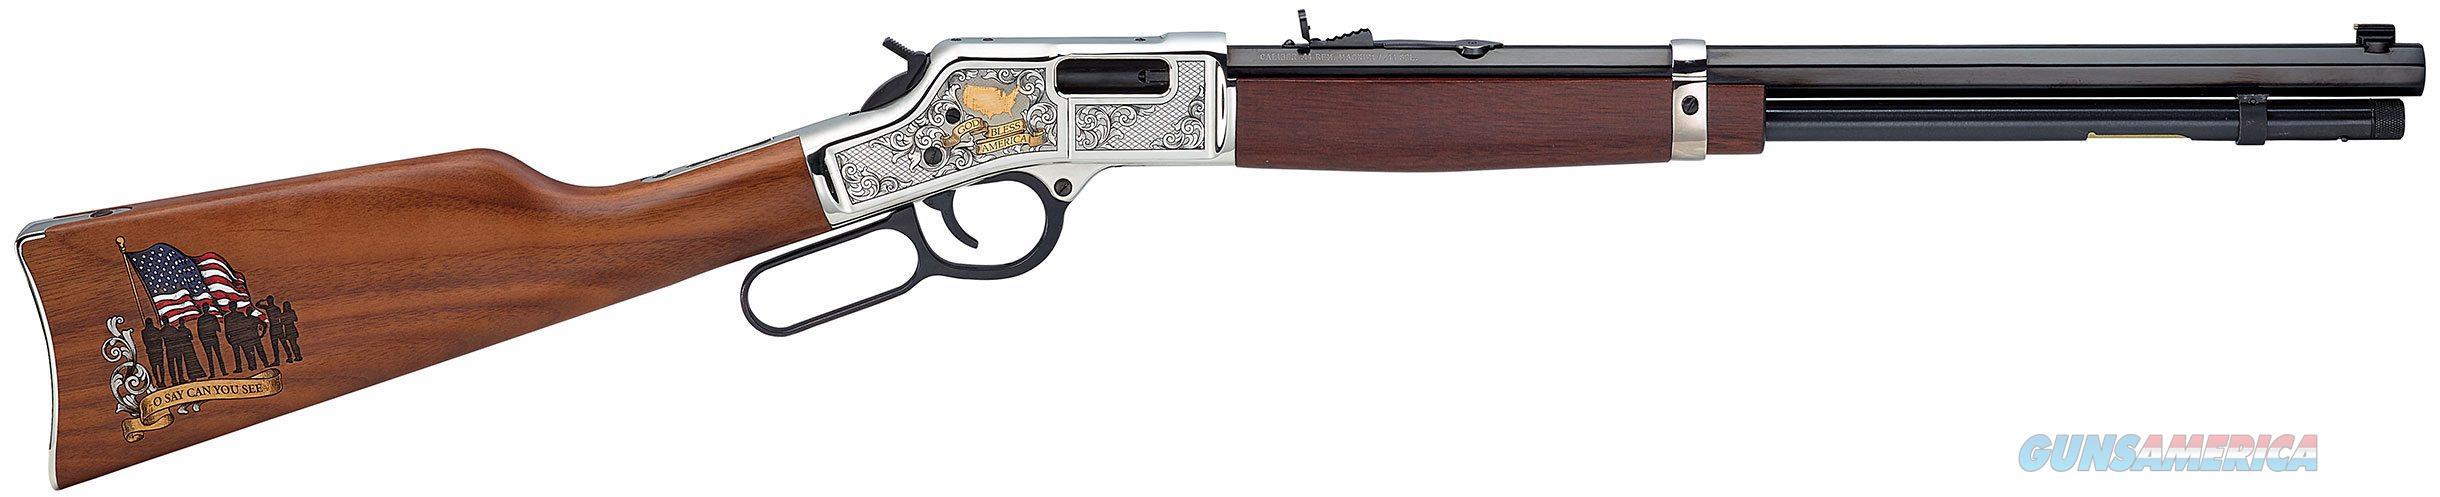 "Henry God Bless America Edition Big Boy .44 Magnum 20"" 10+1 - New in Box  Guns > Rifles > Henry Rifle Company"